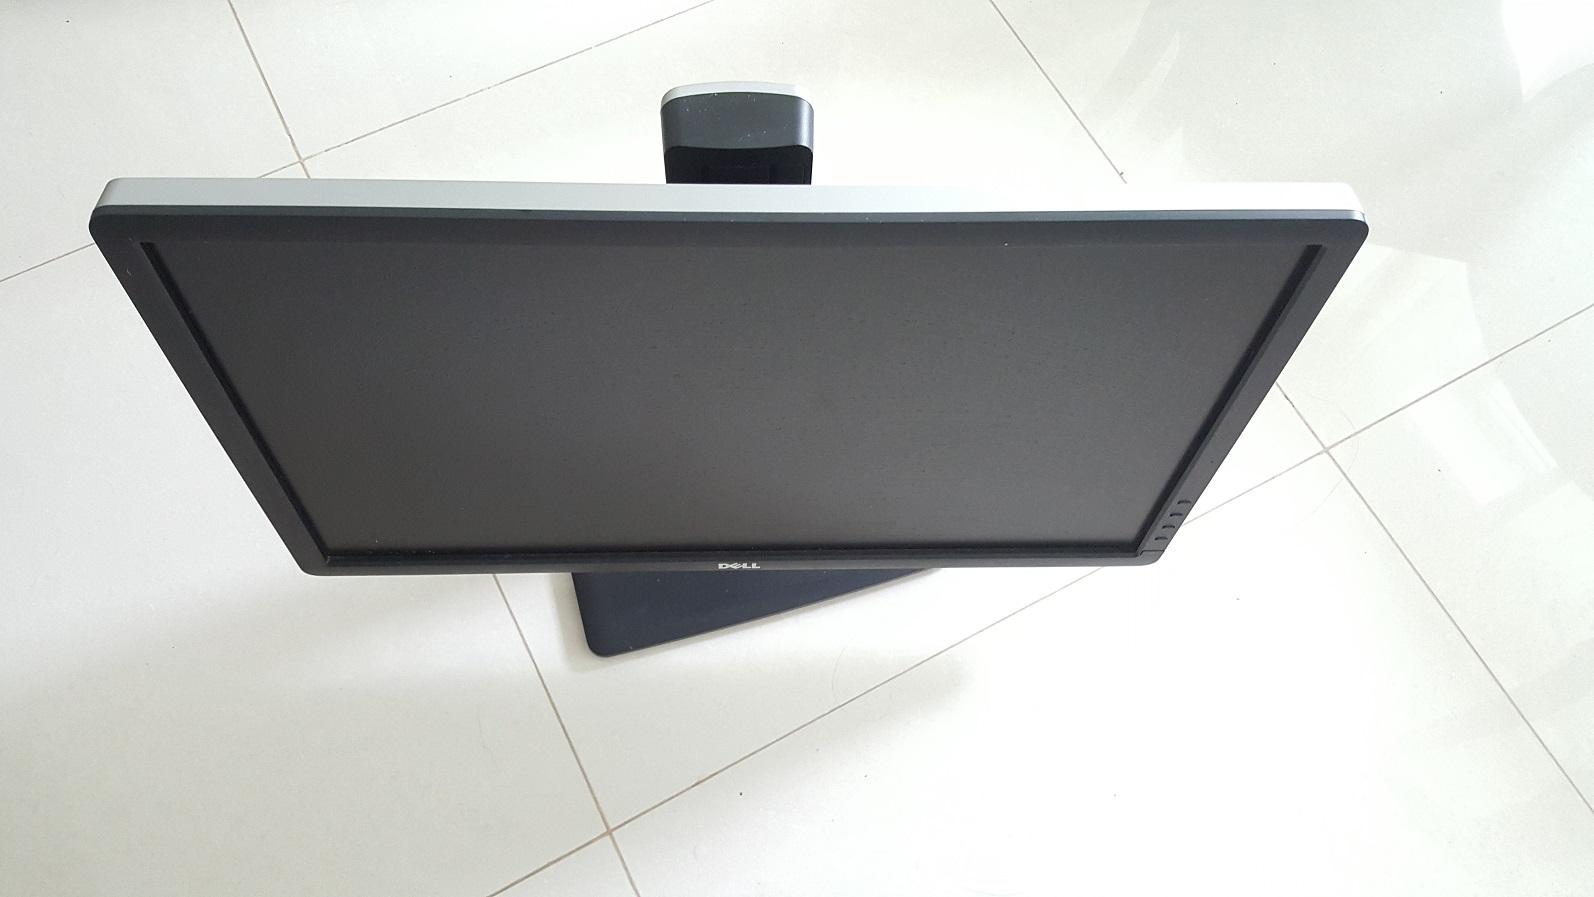 dell u2312 and u2311 ultrasharp ips monitor  23' led monitor